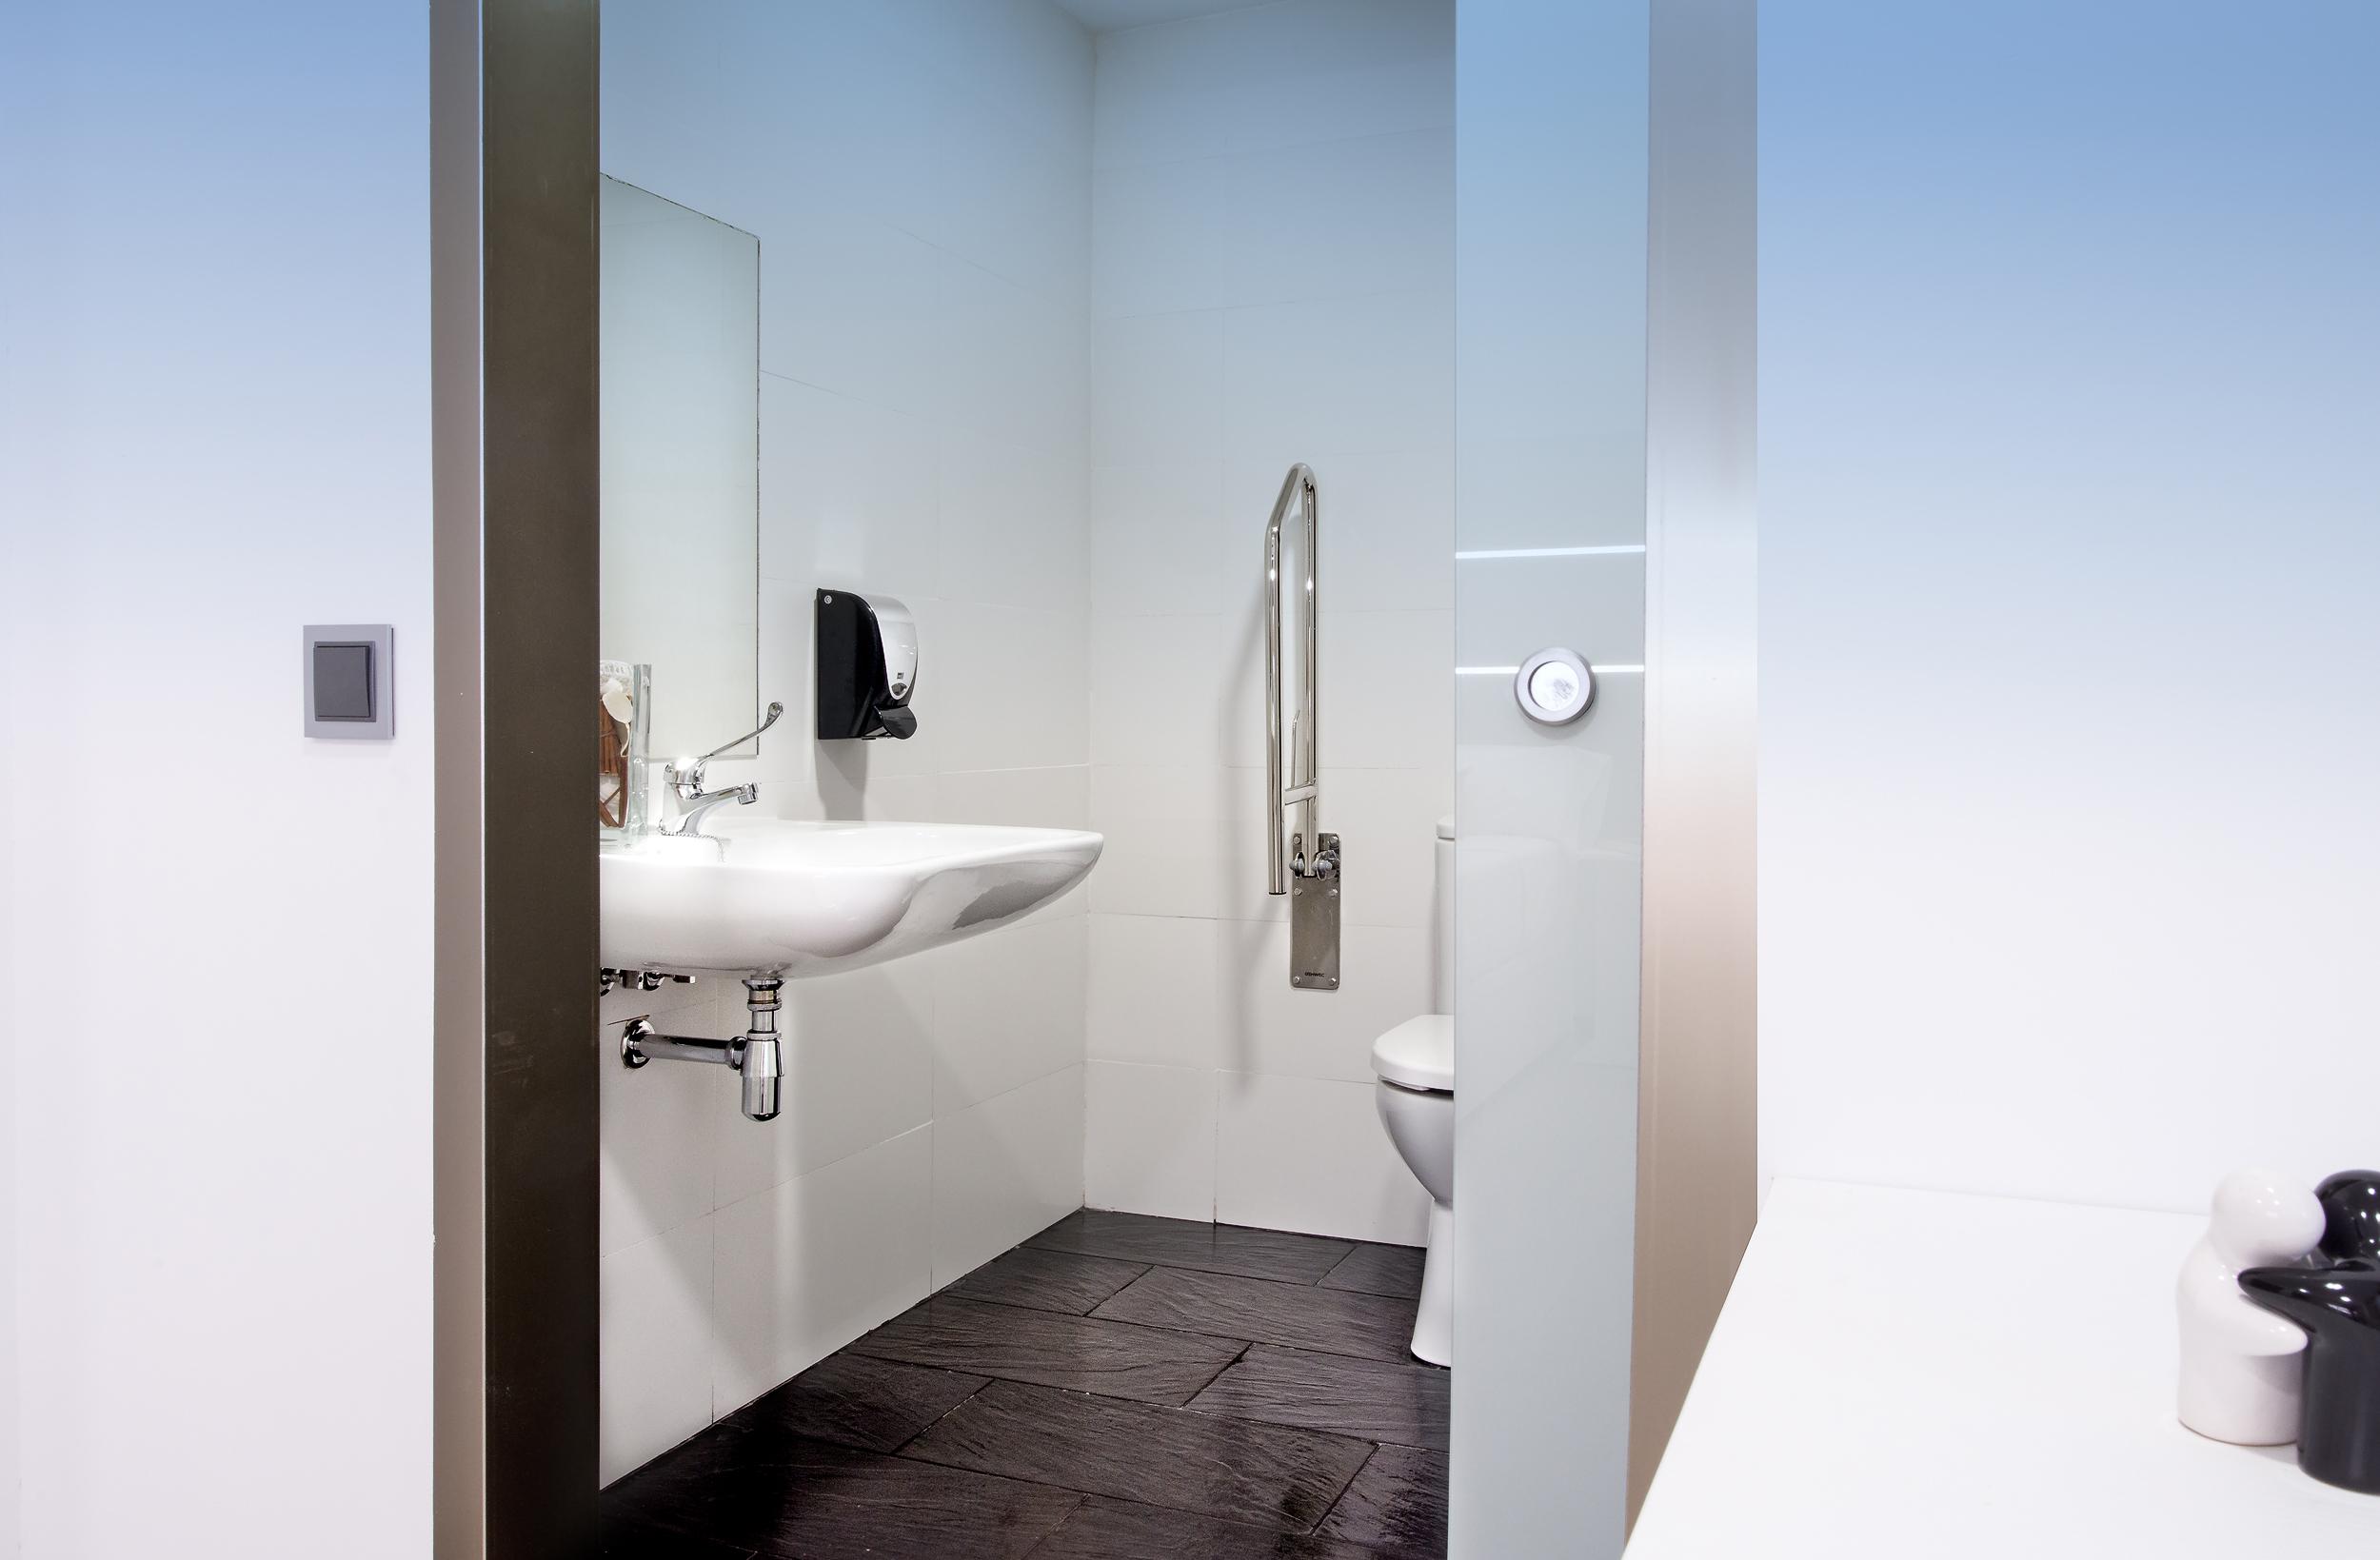 HOSTAL habitacion doble1 sin balcon (minusválidos)